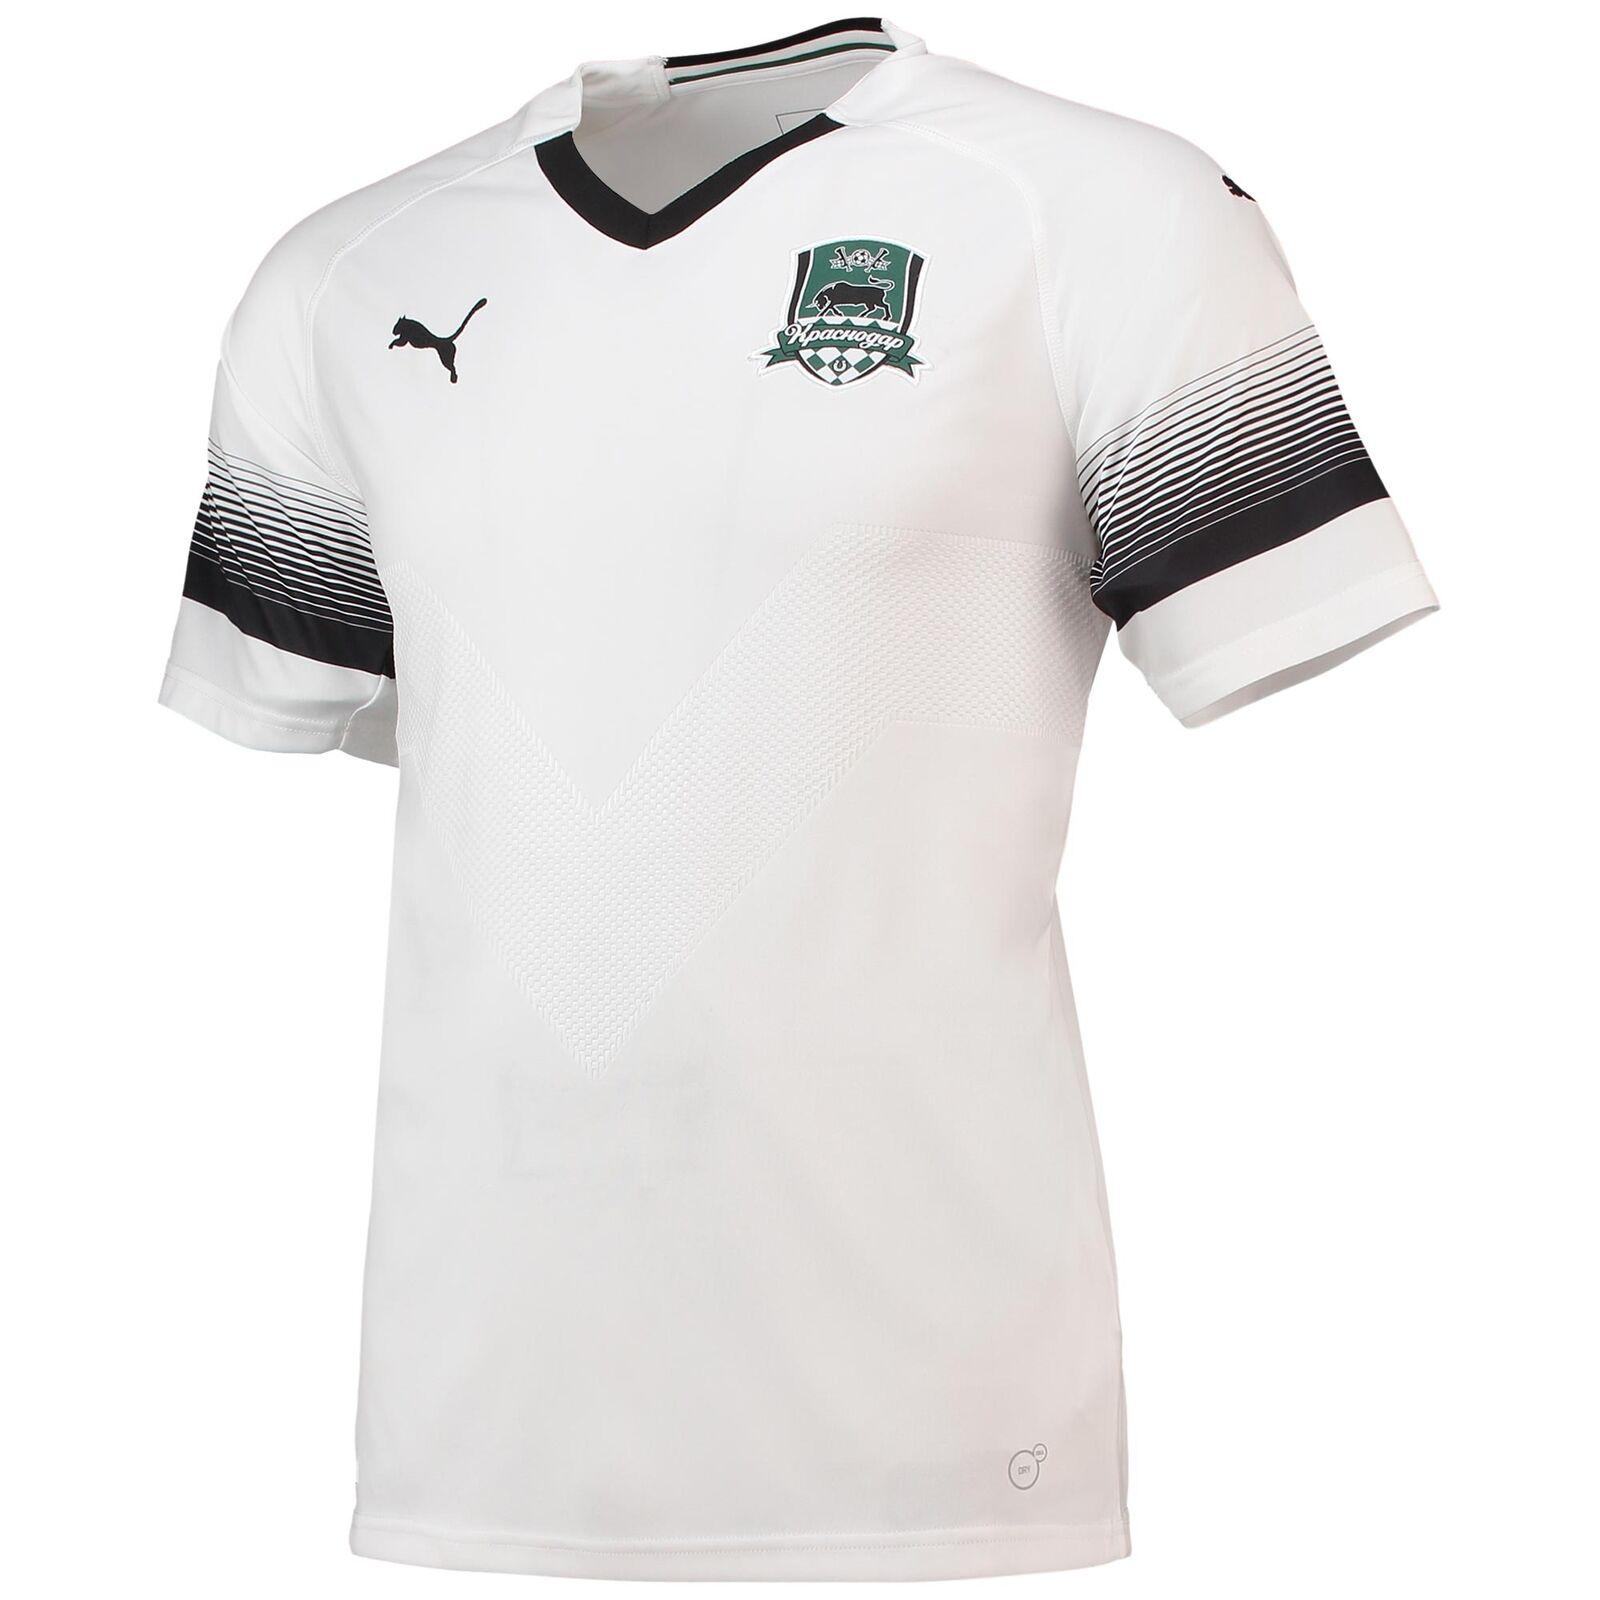 Offiziell FC Krasnodar Auswärts Shirt Fußball Trikot Oberteil 201819 Herren Herren Herren PUMA f88cf6